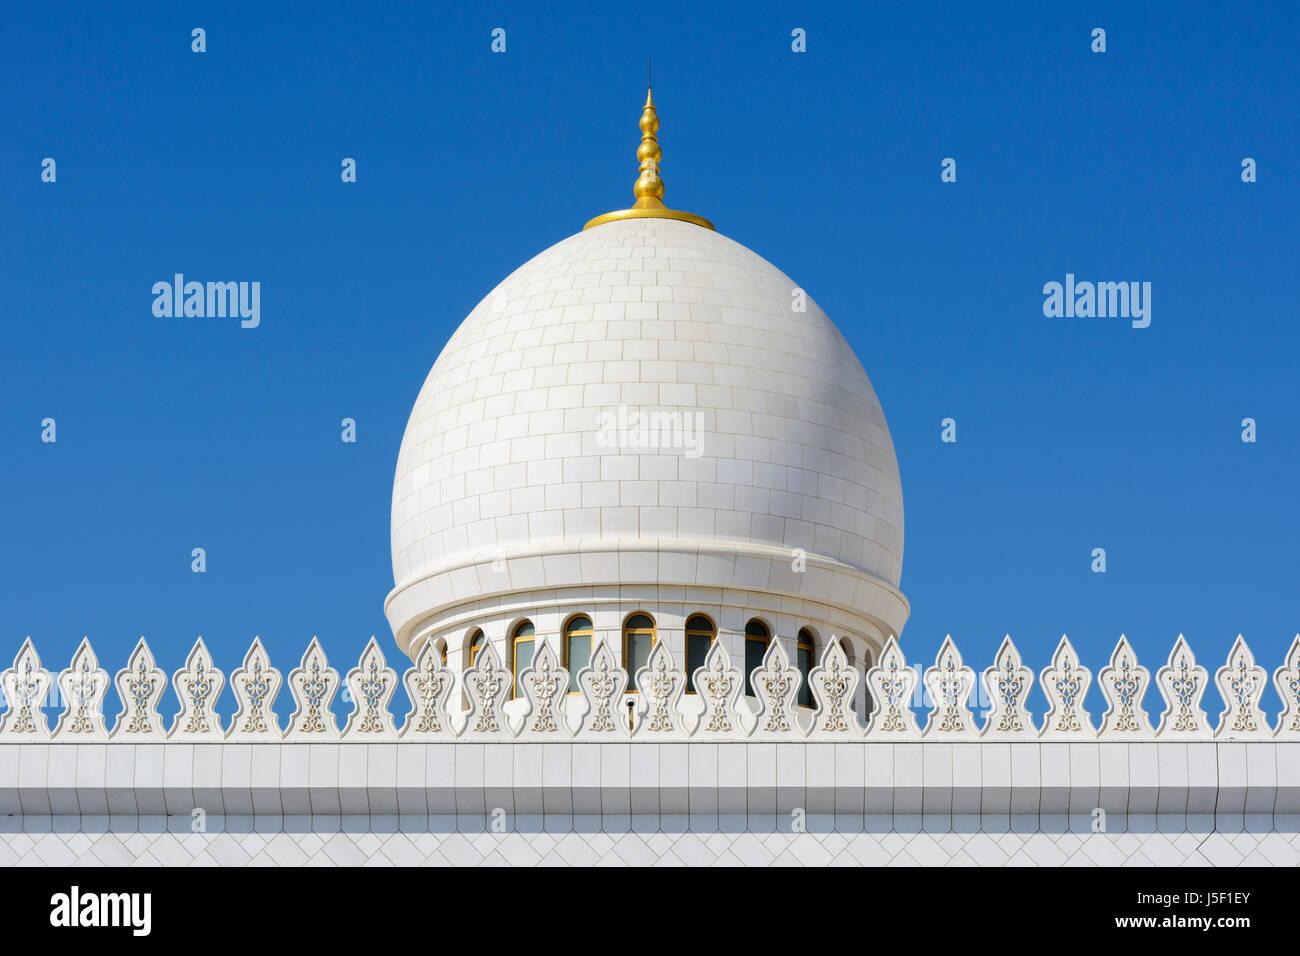 Exterior: Sheikh Zayed Grand Mosque, Abu Dhabi, United Arab Emirates